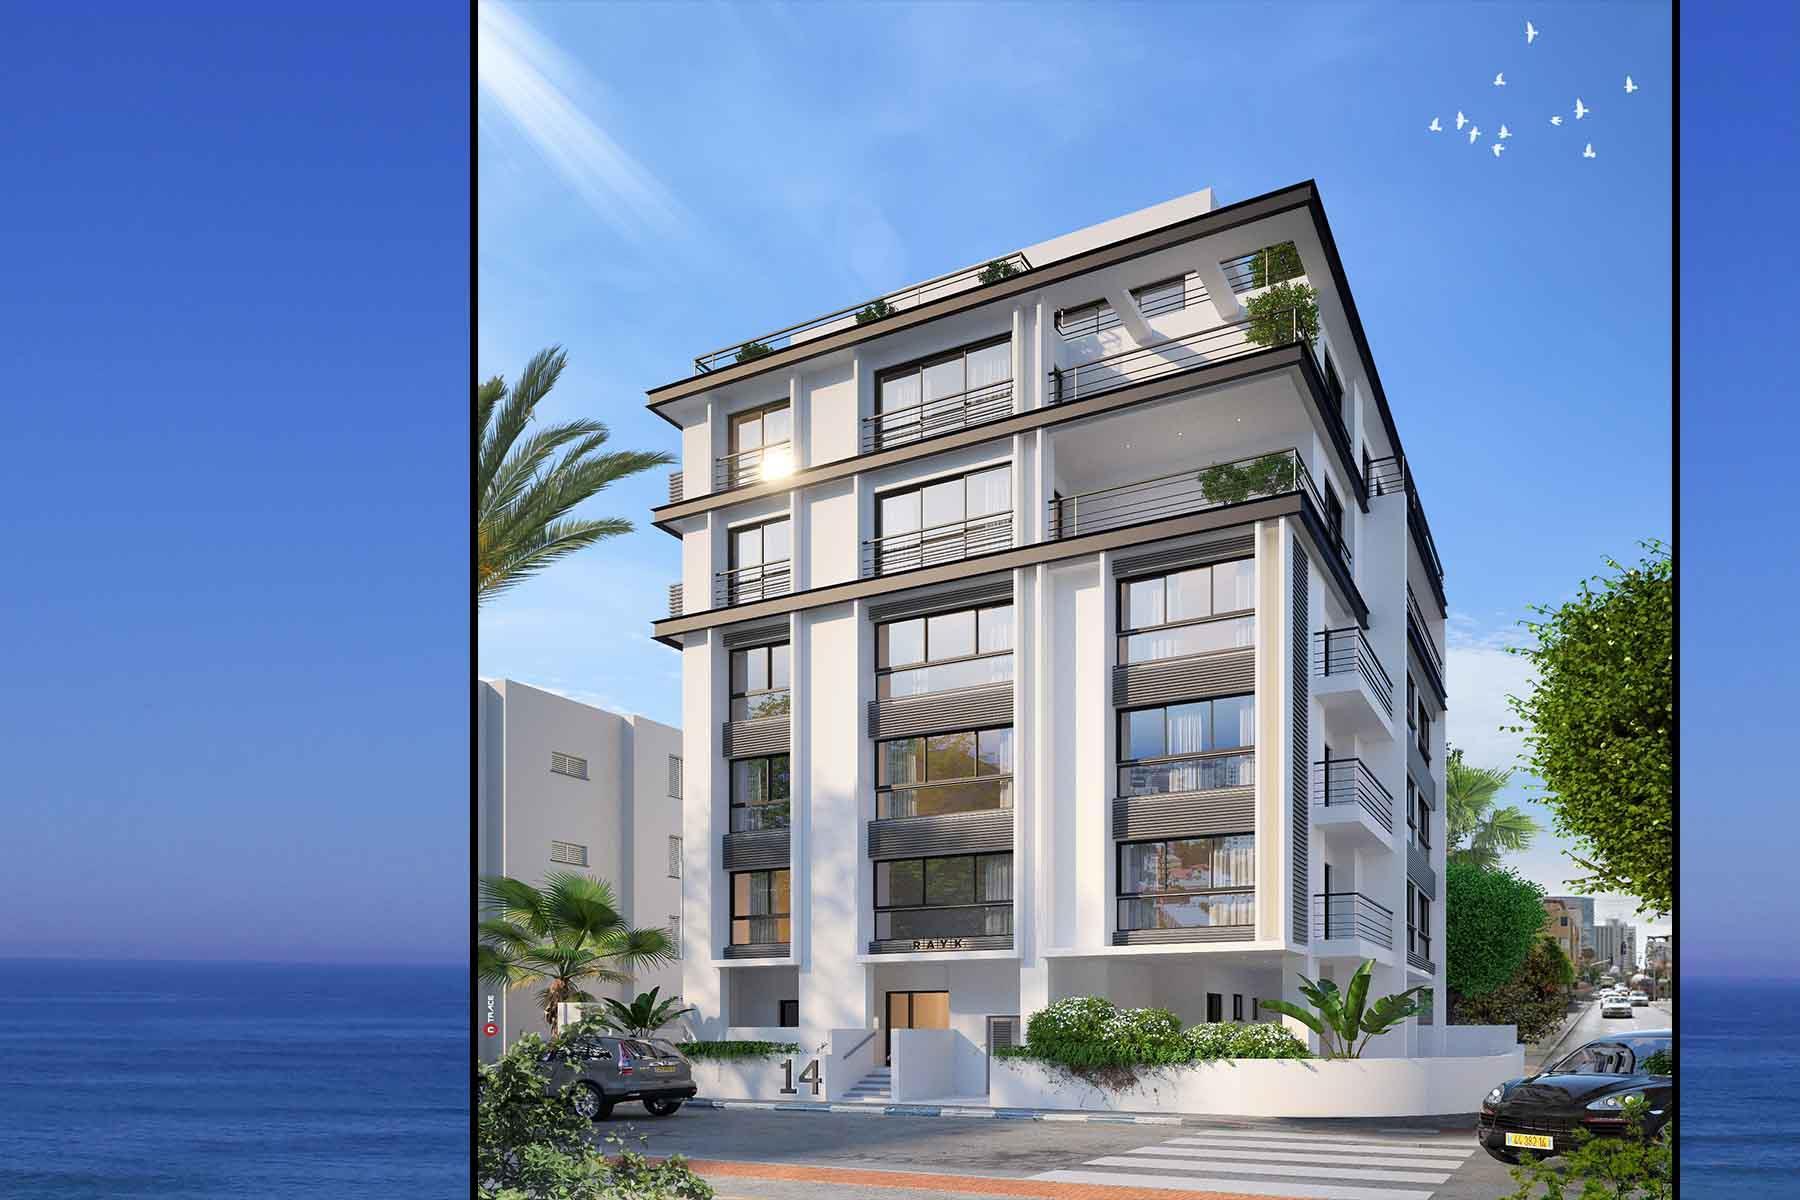 'Apartments / Flats' building or community at 'Exquisite New Development Near The Sea Hayarkon 14 Tel Aviv, Israel 6801111 Israel'